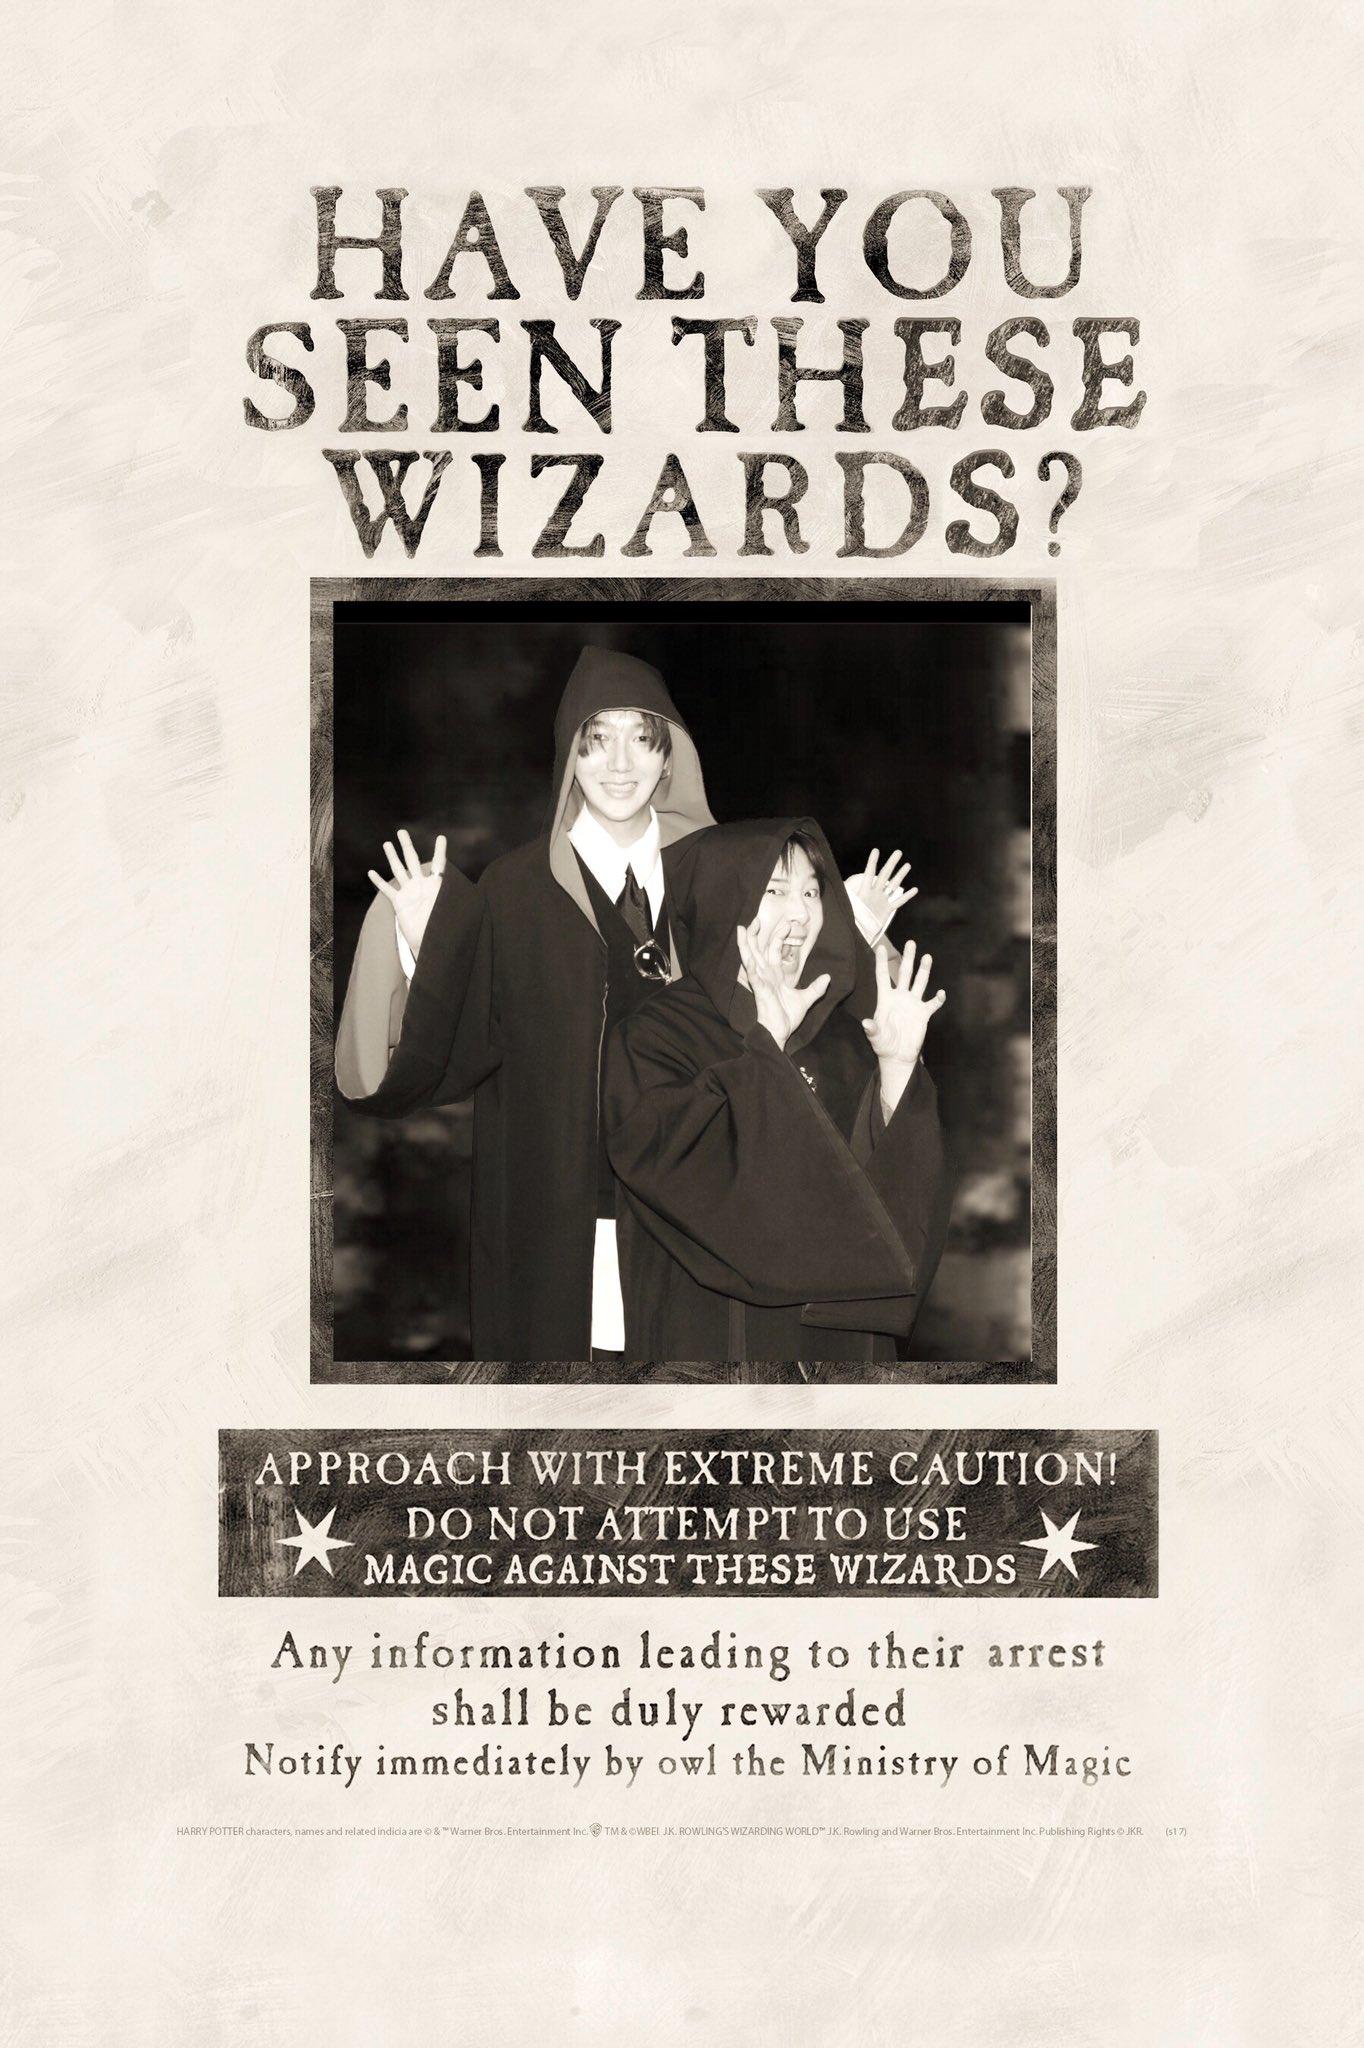 Freshman in Hogwarts �� @Kjjzz https://t.co/OcWeSCGcCF